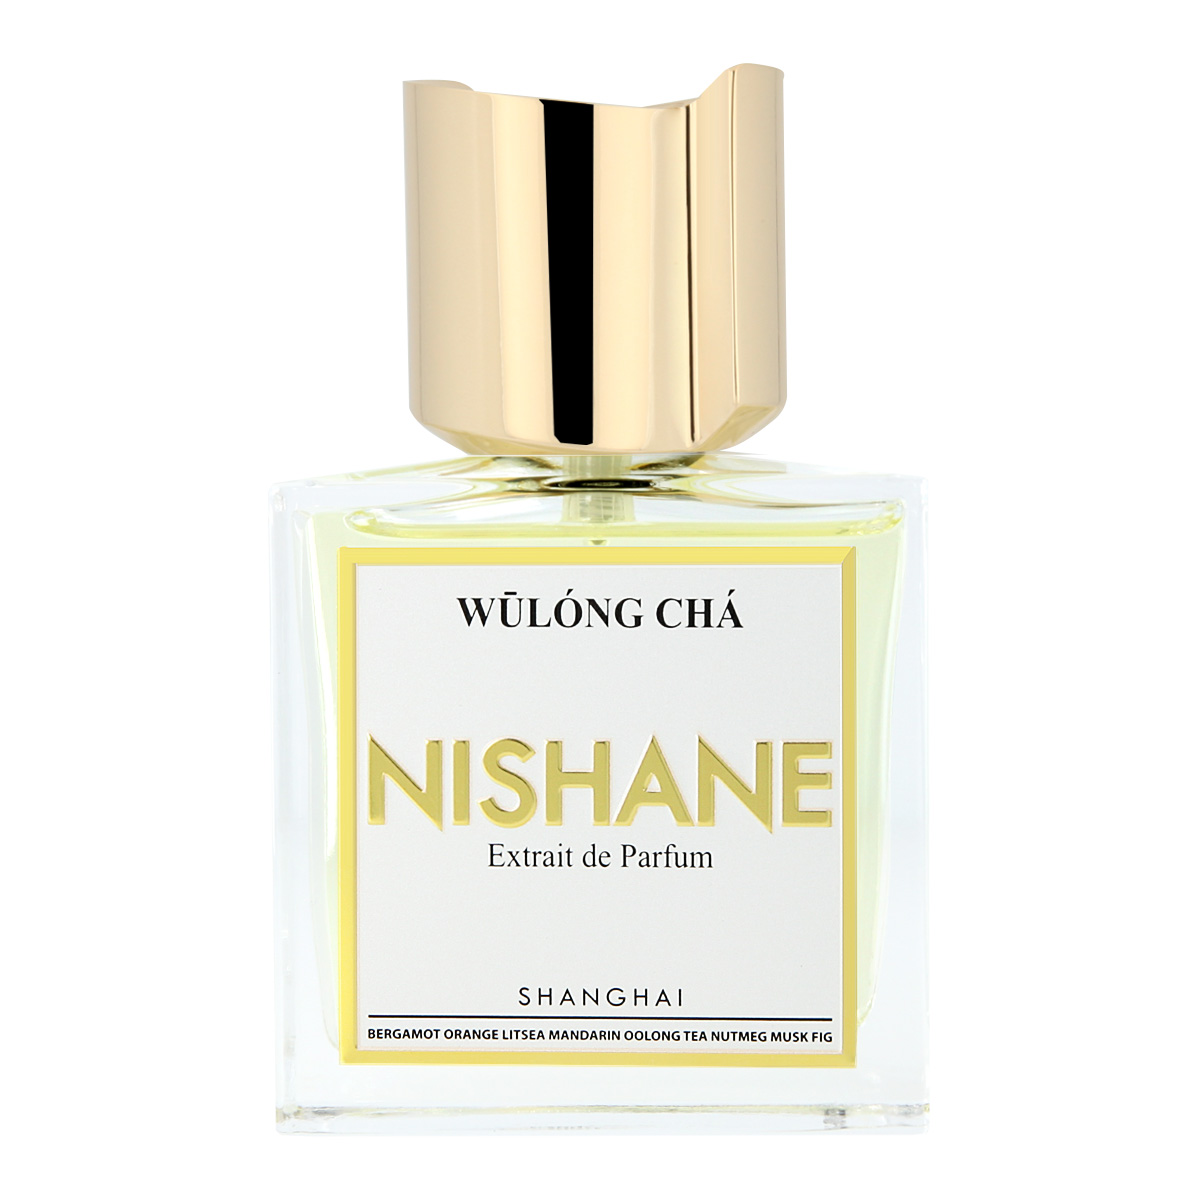 Nishane Wulong Cha Extrait de Parfum 50 ml (unisex) 131187